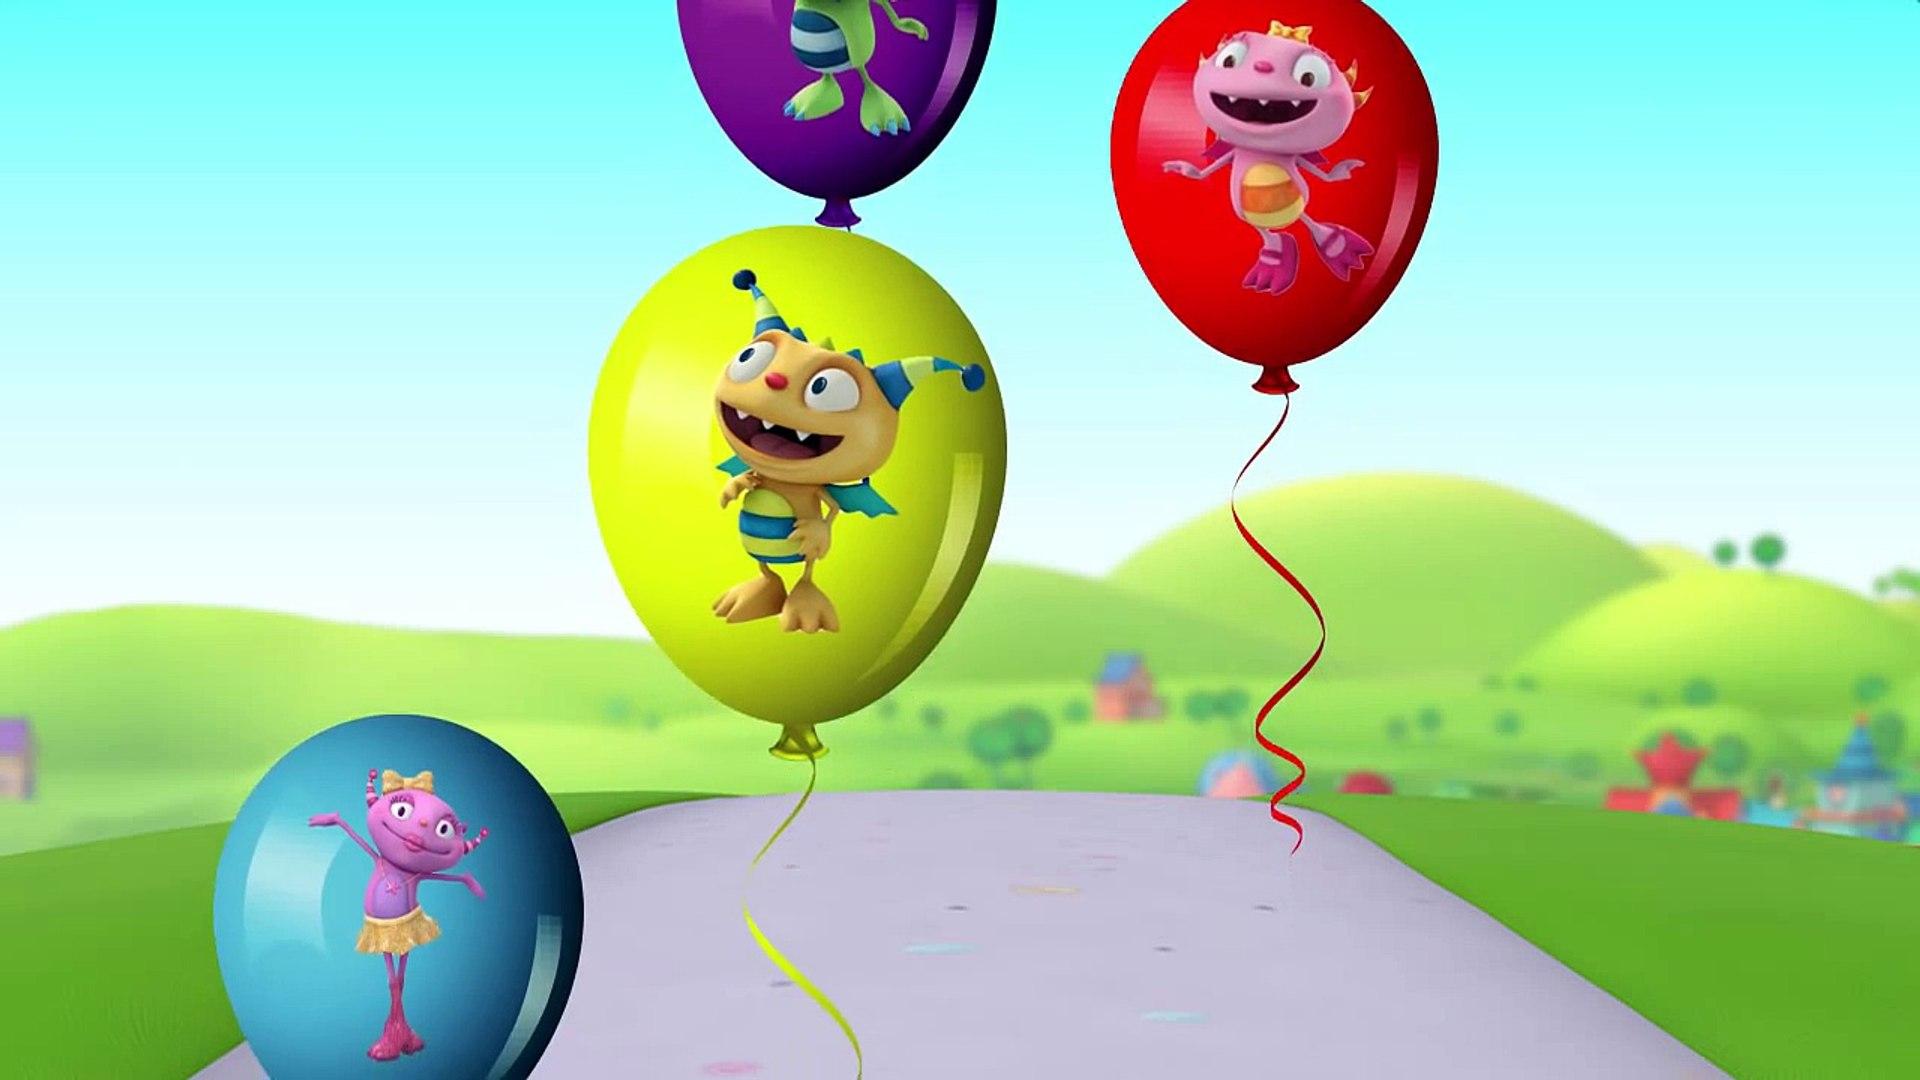 HENRY HUGGLEMONSTER ABC Song Alphabet Song ABC Nursery Rhymes ABC Song for Children